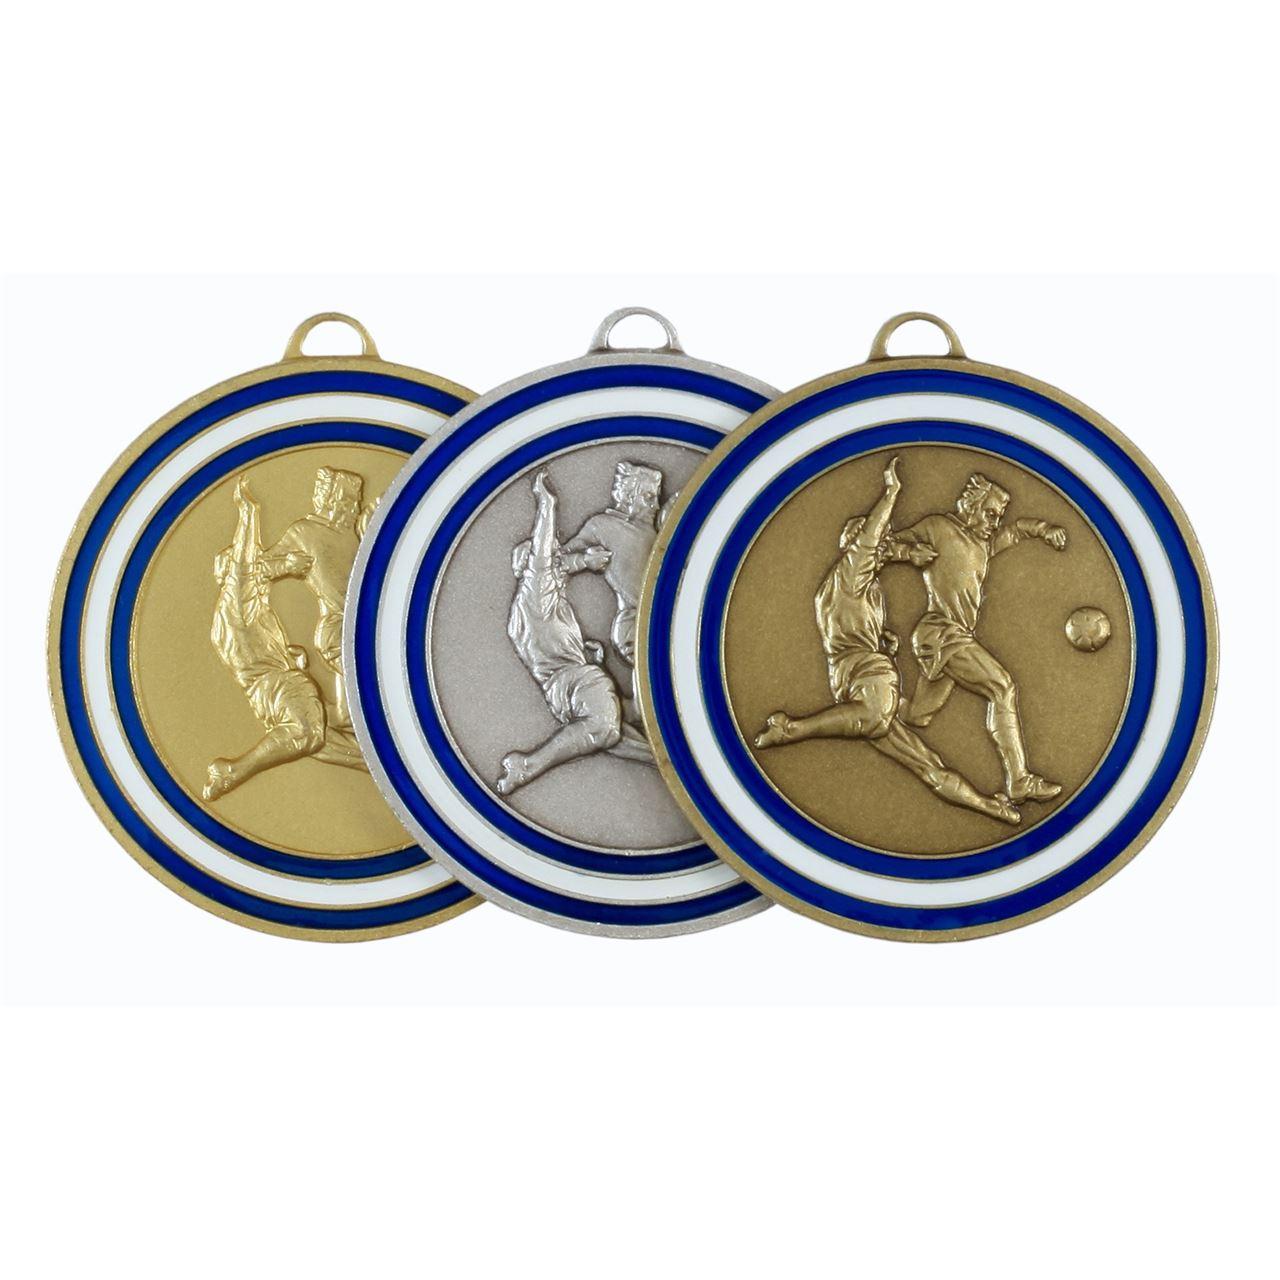 Blue Coloured Enamel Football Medal (size: 50mm) - 175